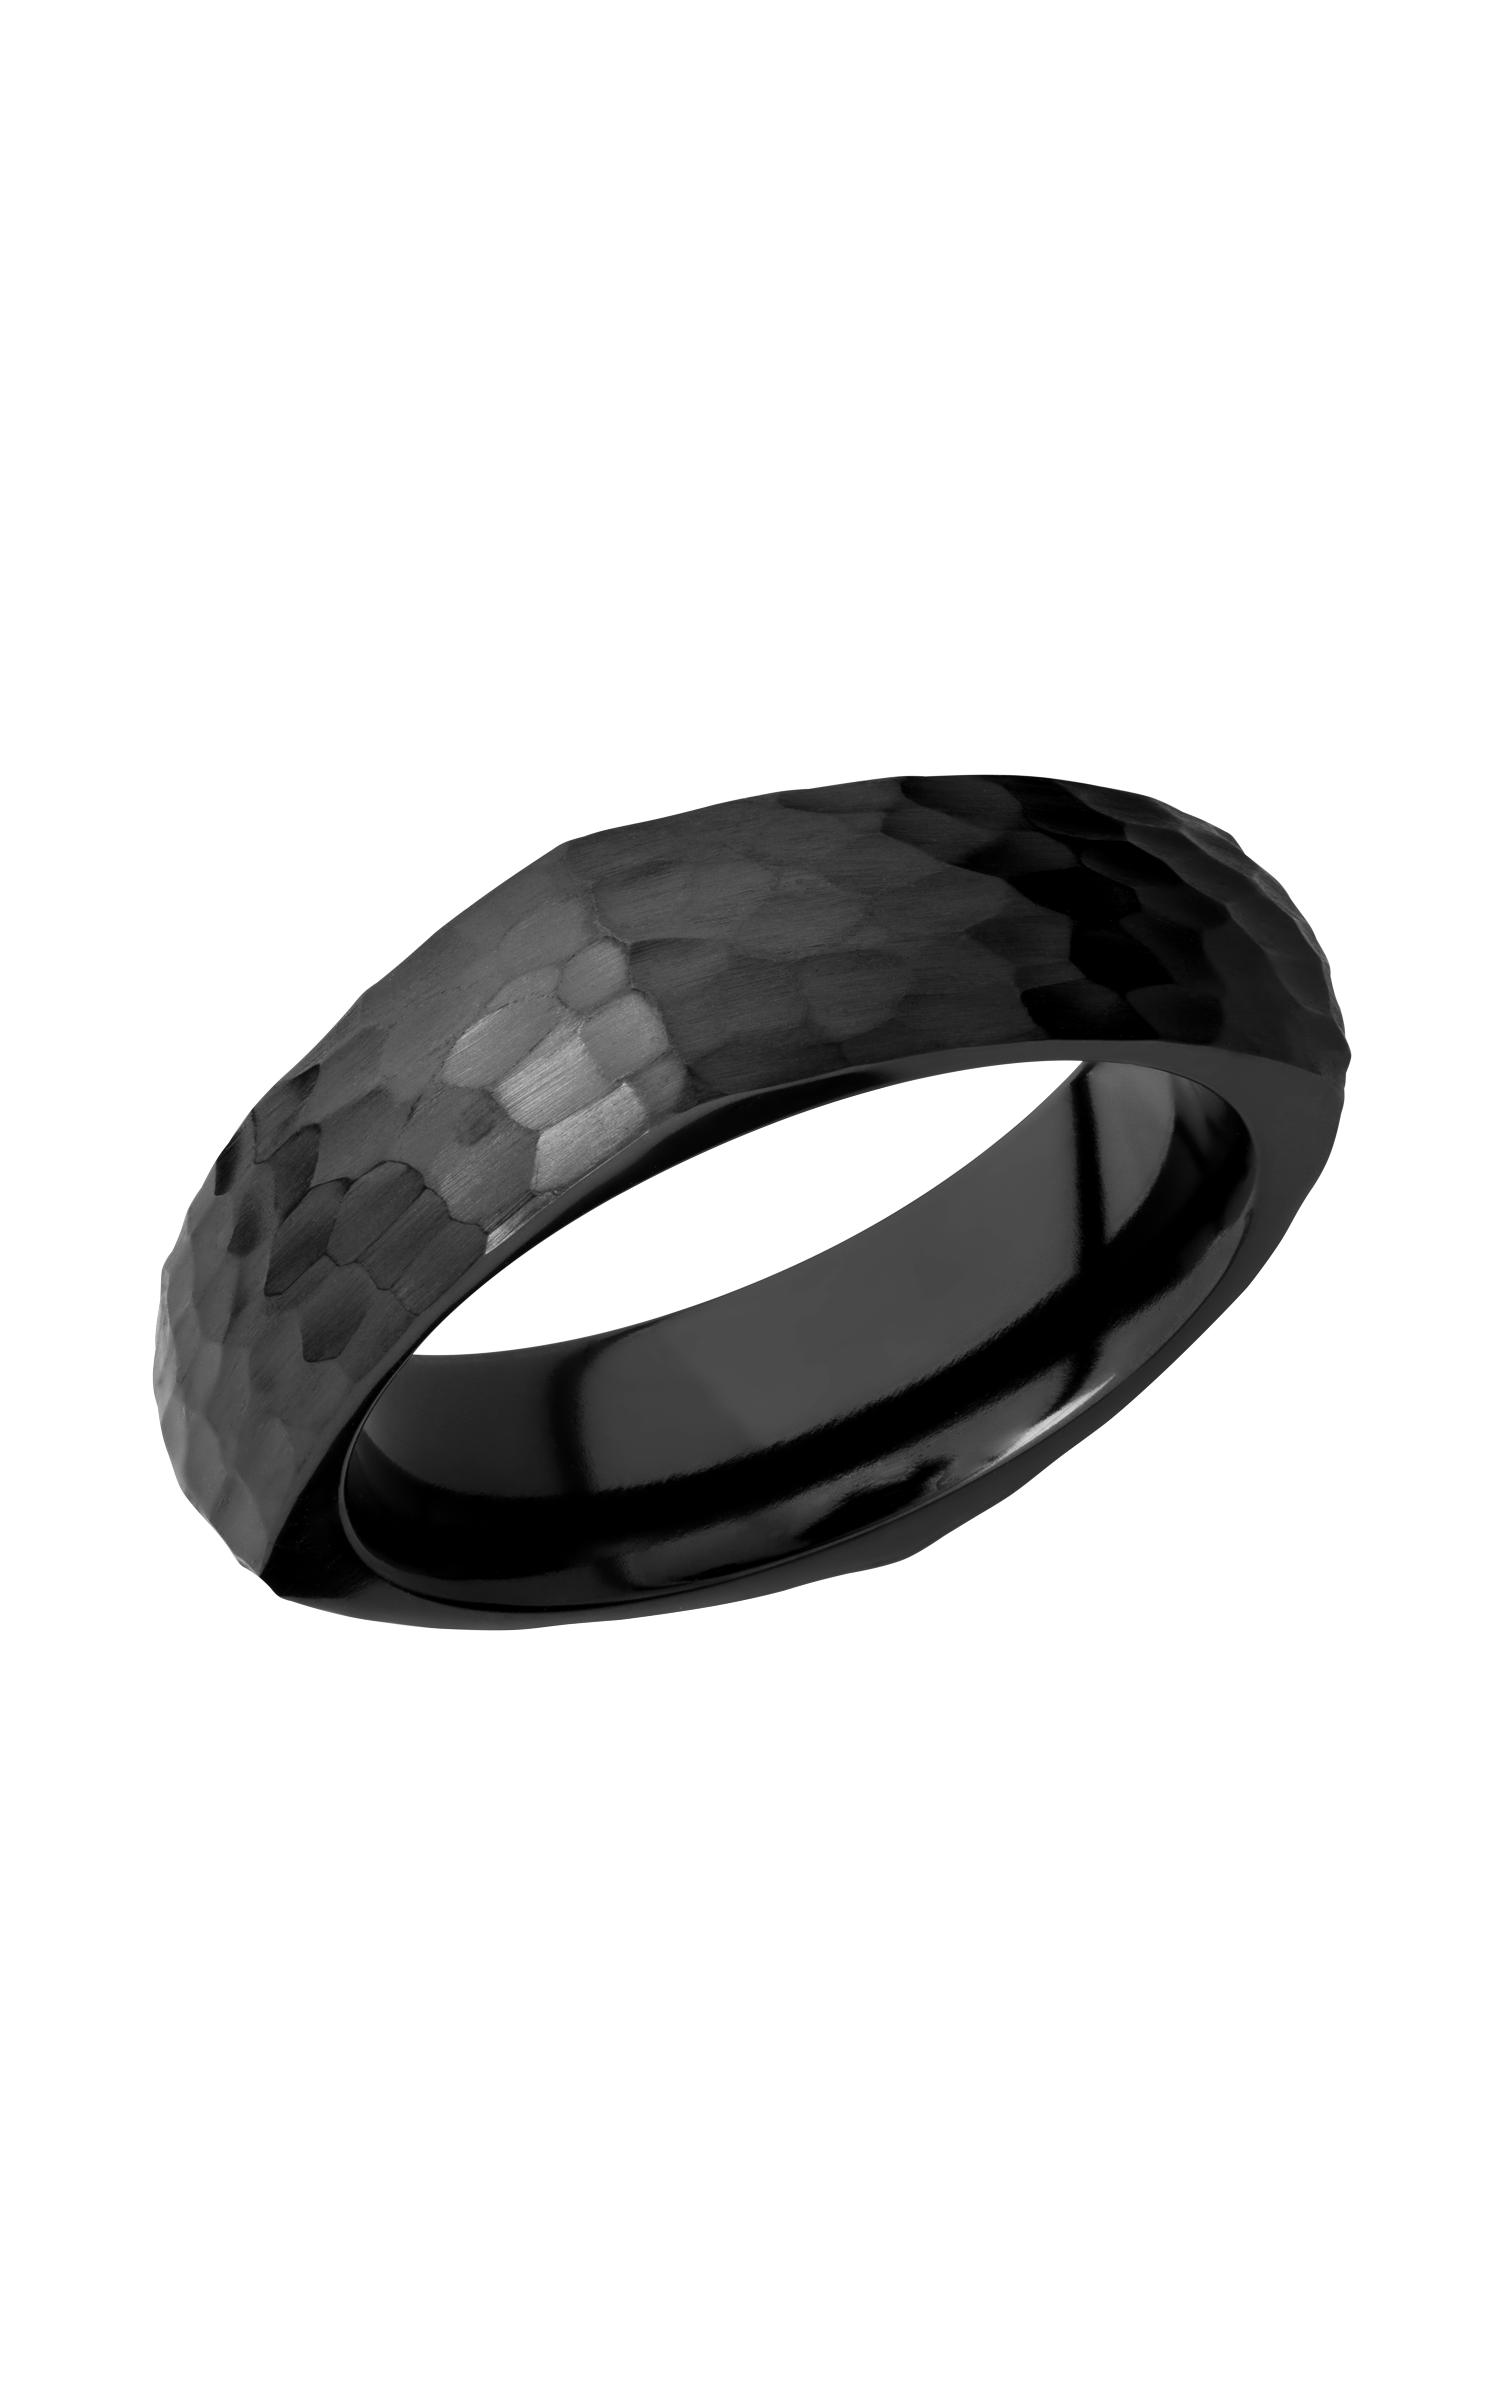 Lashbrook Zirconium Z7DSQ product image